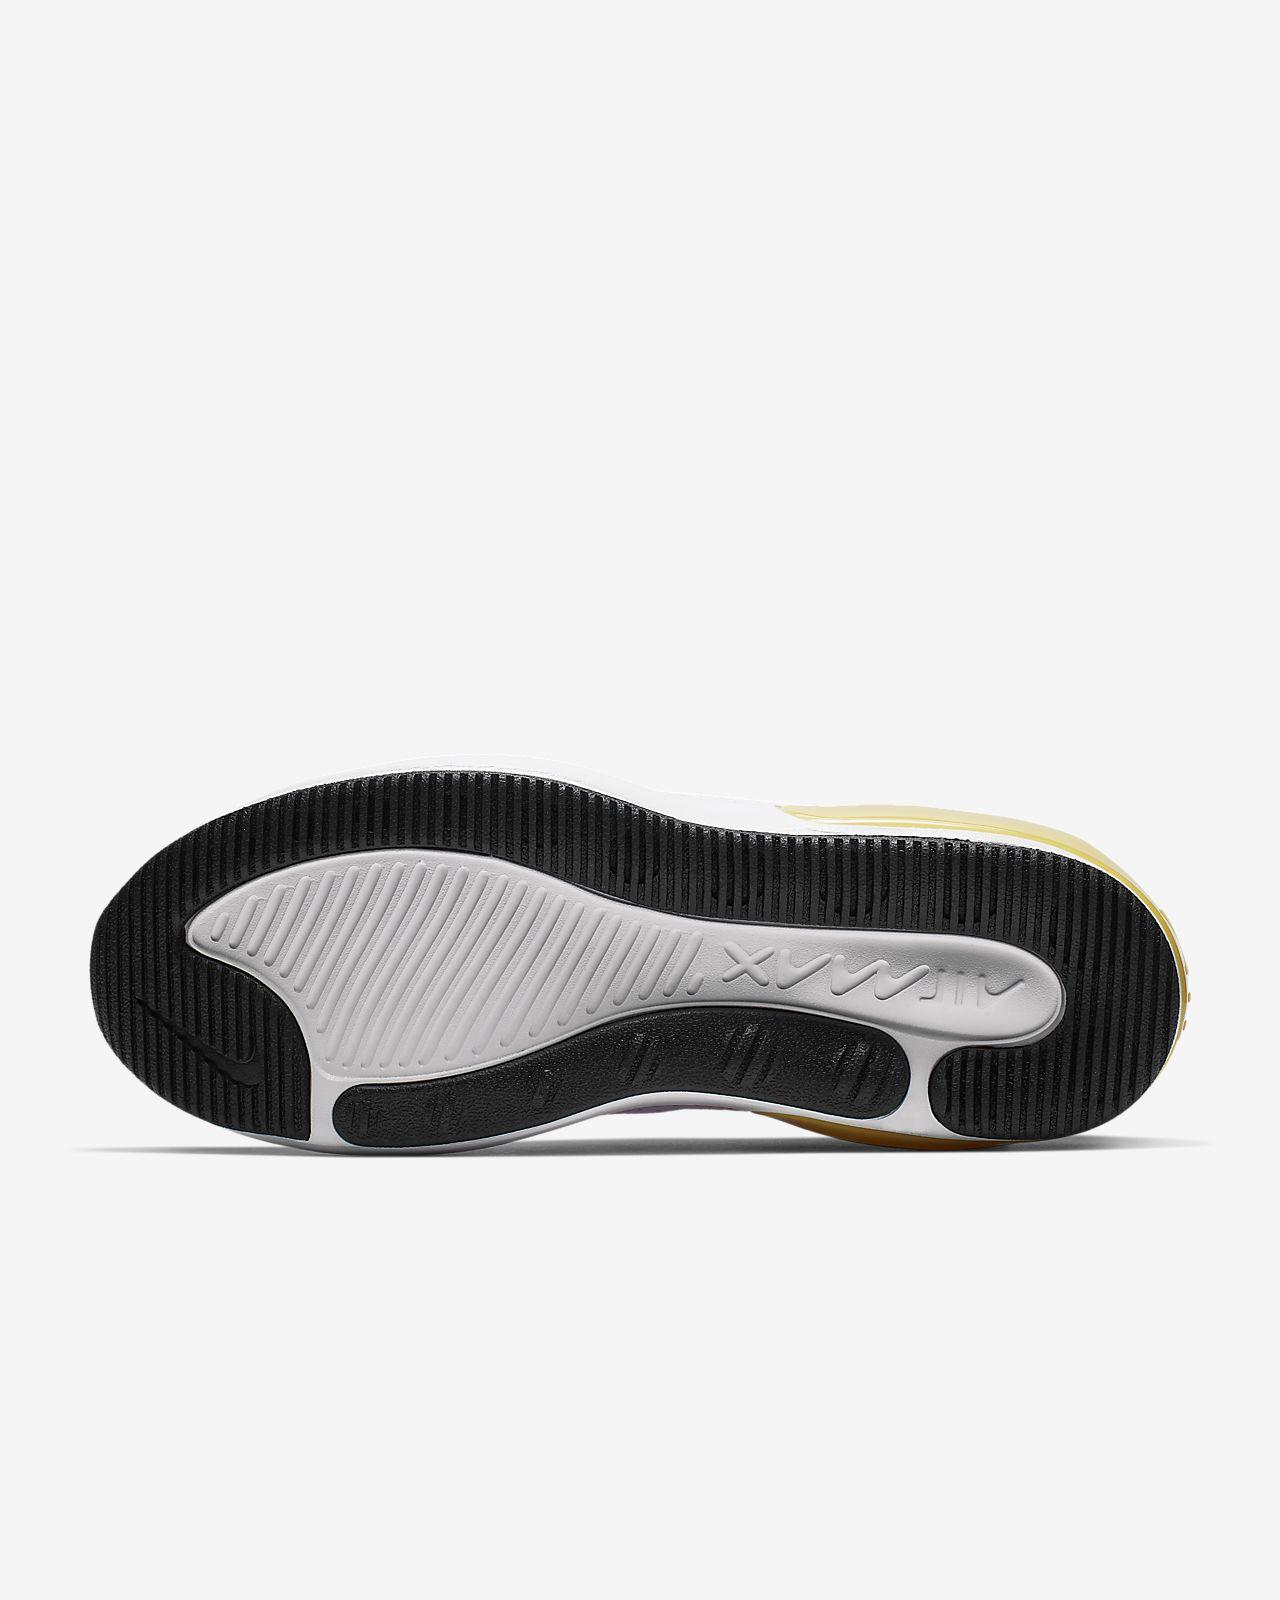 new concept 7f357 a9f2f ... Sko Nike Air Max Dia SE